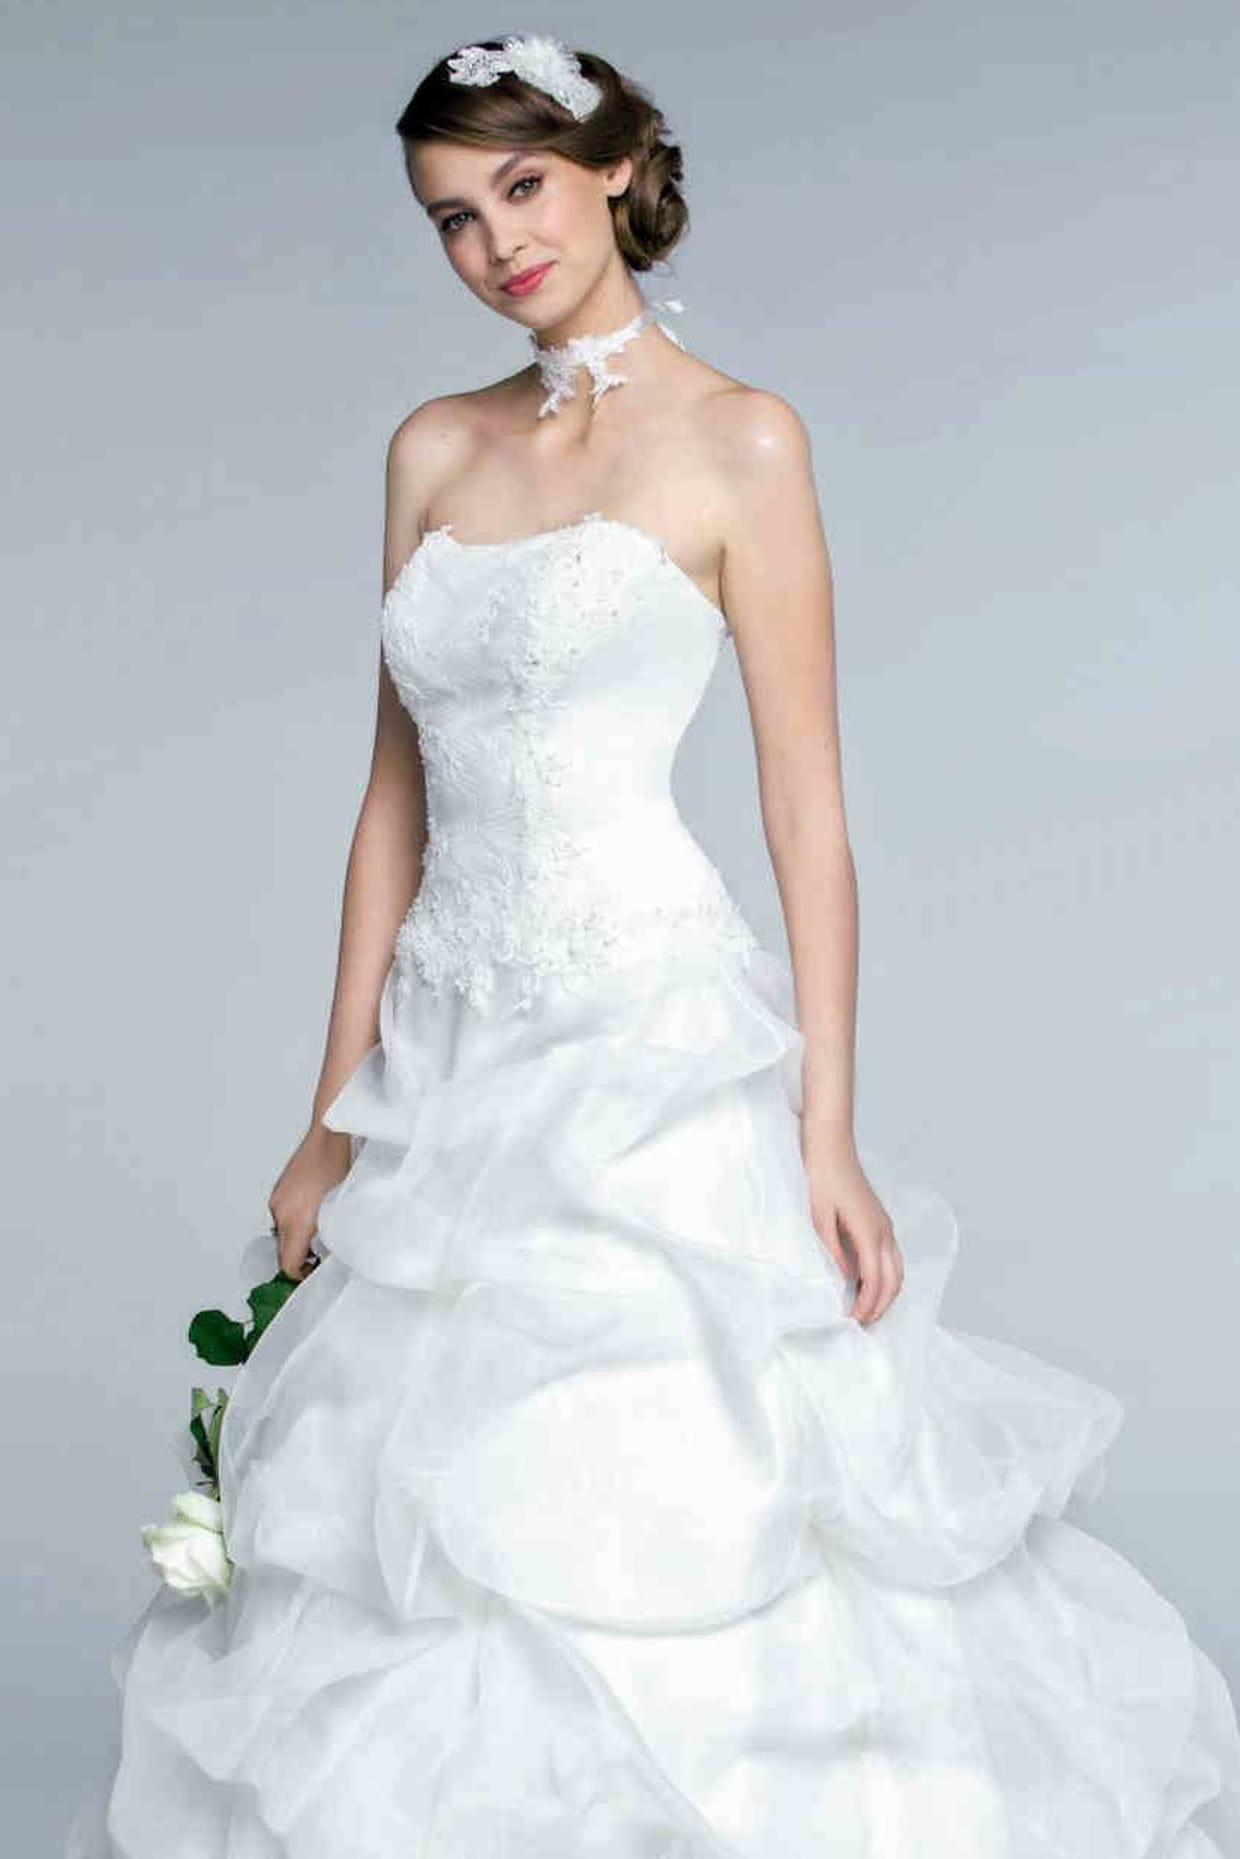 Robe de mari e rembl me for Robes de mariage en consignation ct